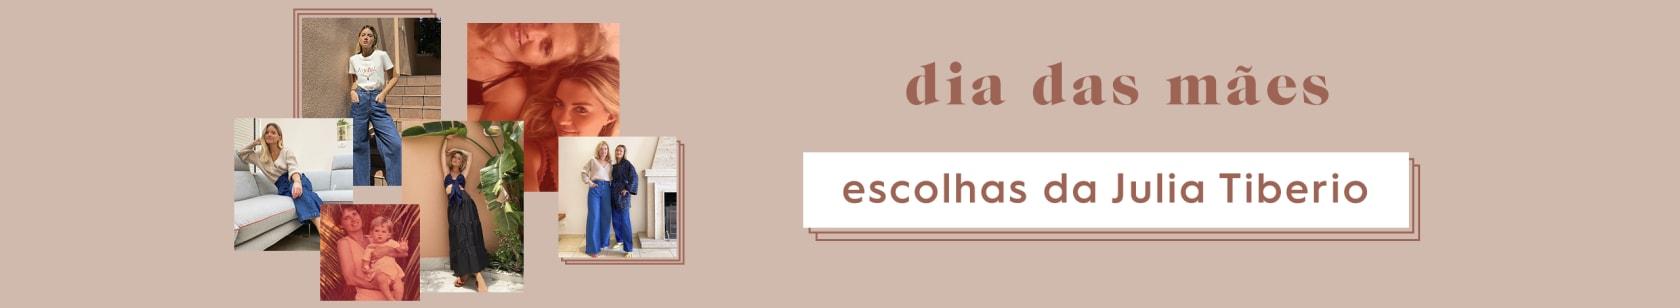 ESCOLHAS DA JULIA TIBERIO